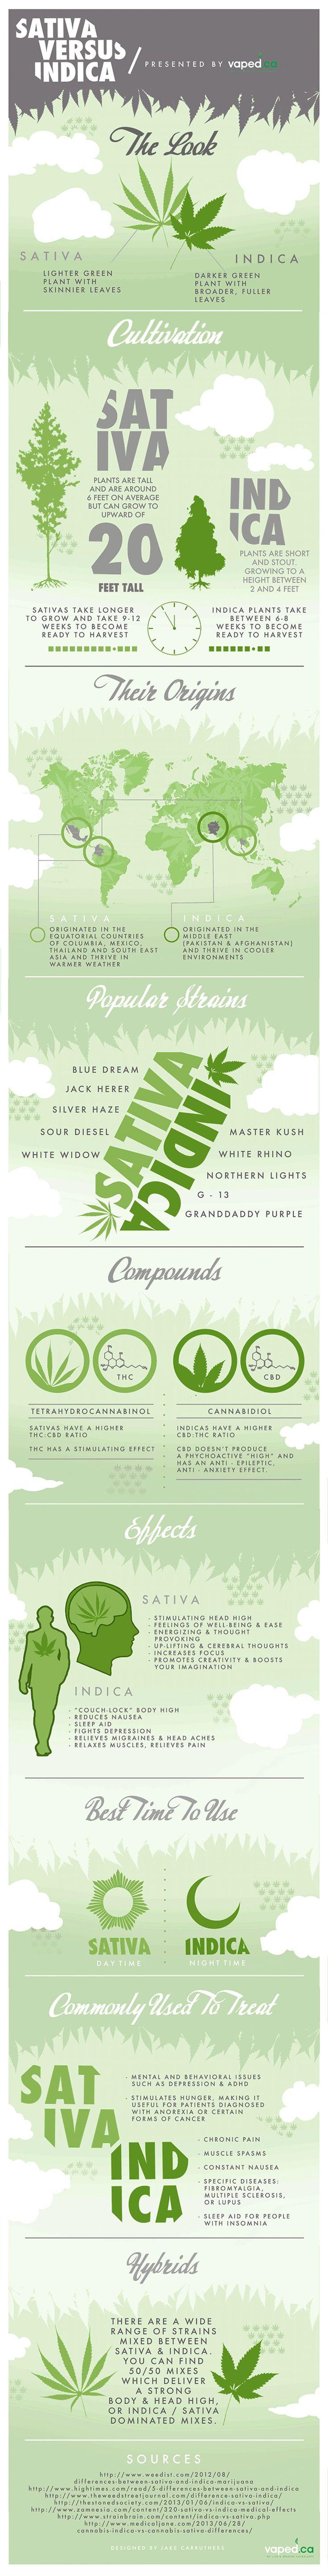 Sativa vs Indica Marijuana Infographic